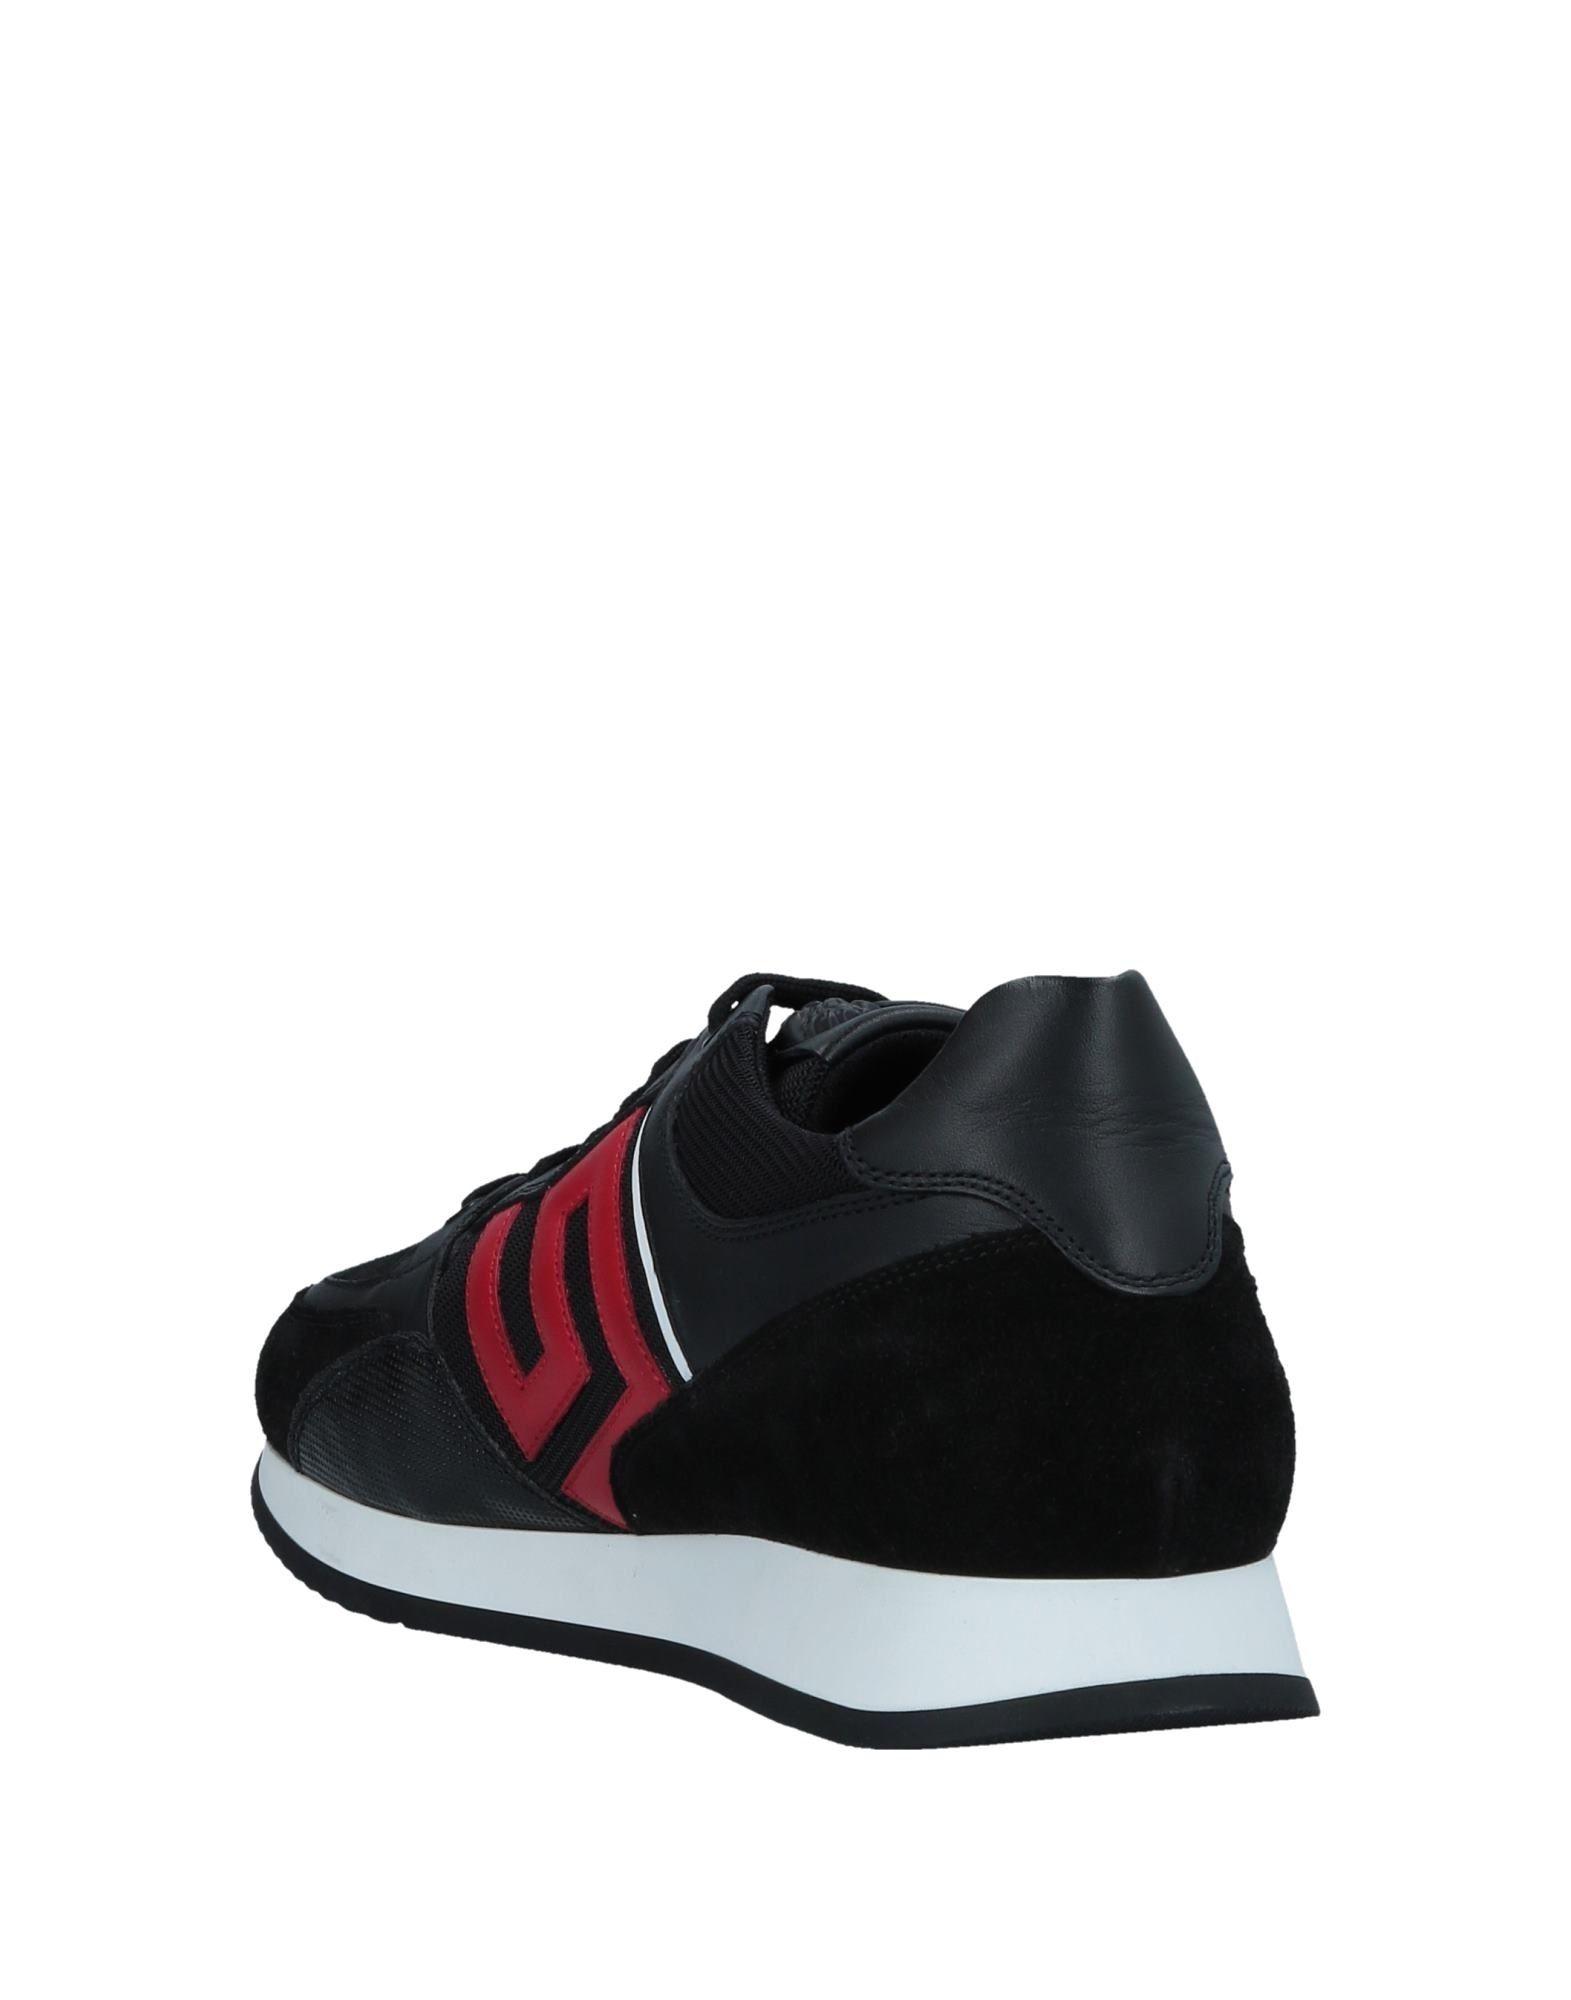 Versace Sneakers Herren  11532697RH Schuhe Gute Qualität beliebte Schuhe 11532697RH 0859cf